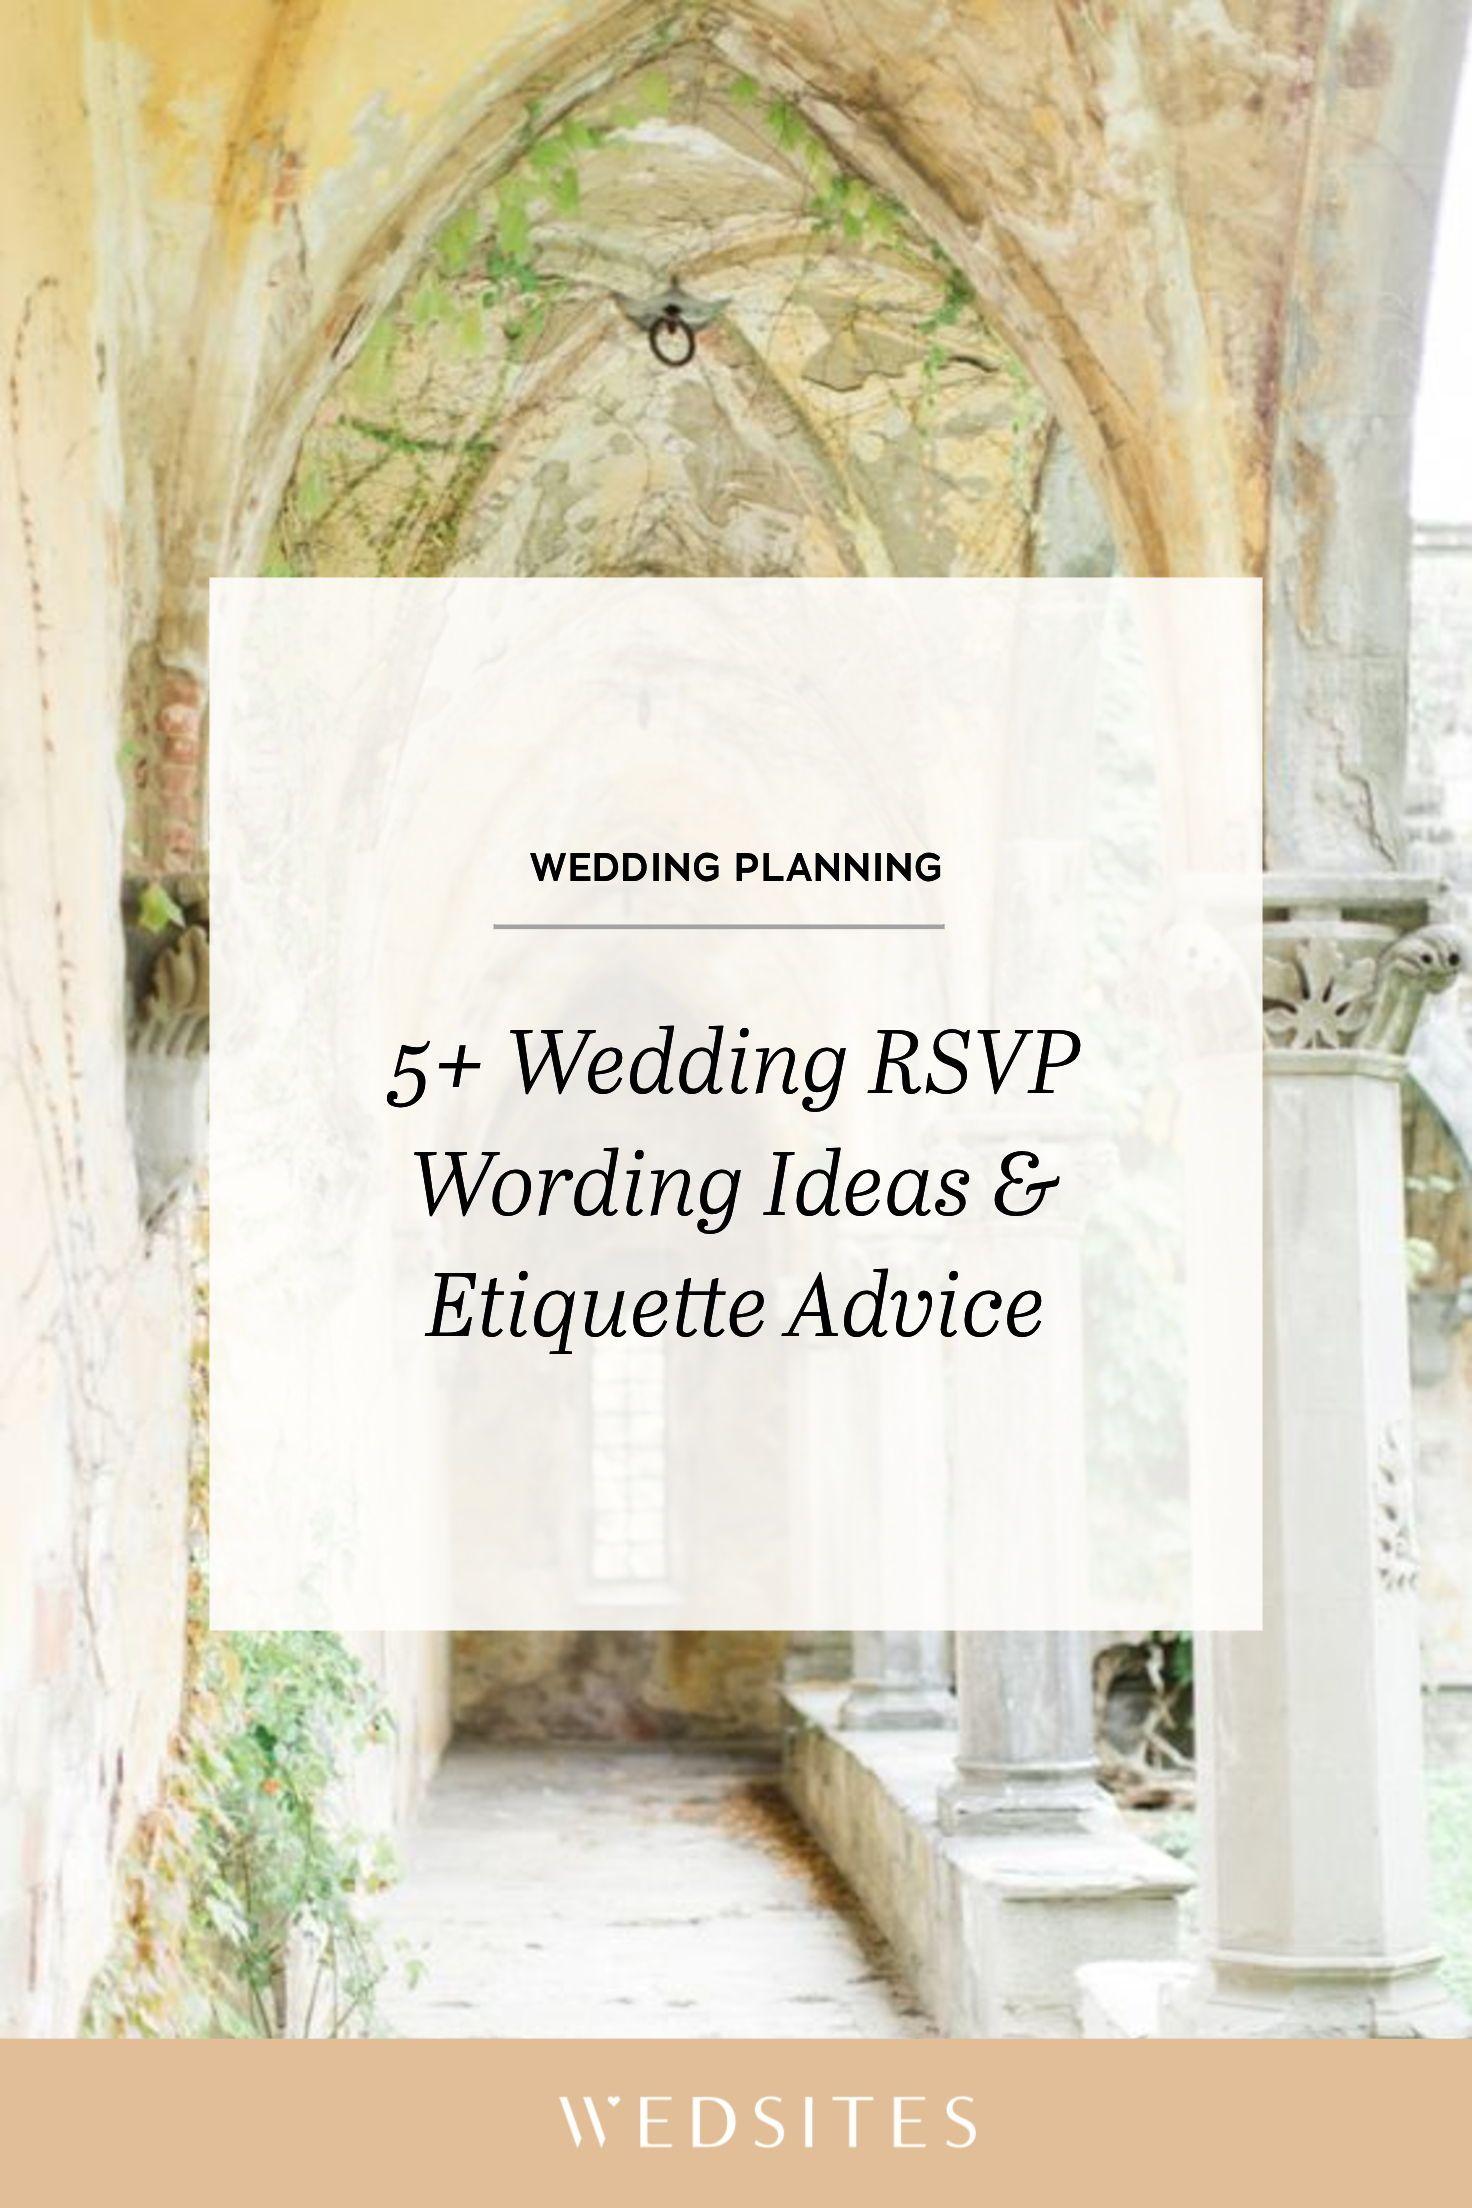 5+ Wedding RSVP Wording Ideas & Timeline Etiquette Rsvp